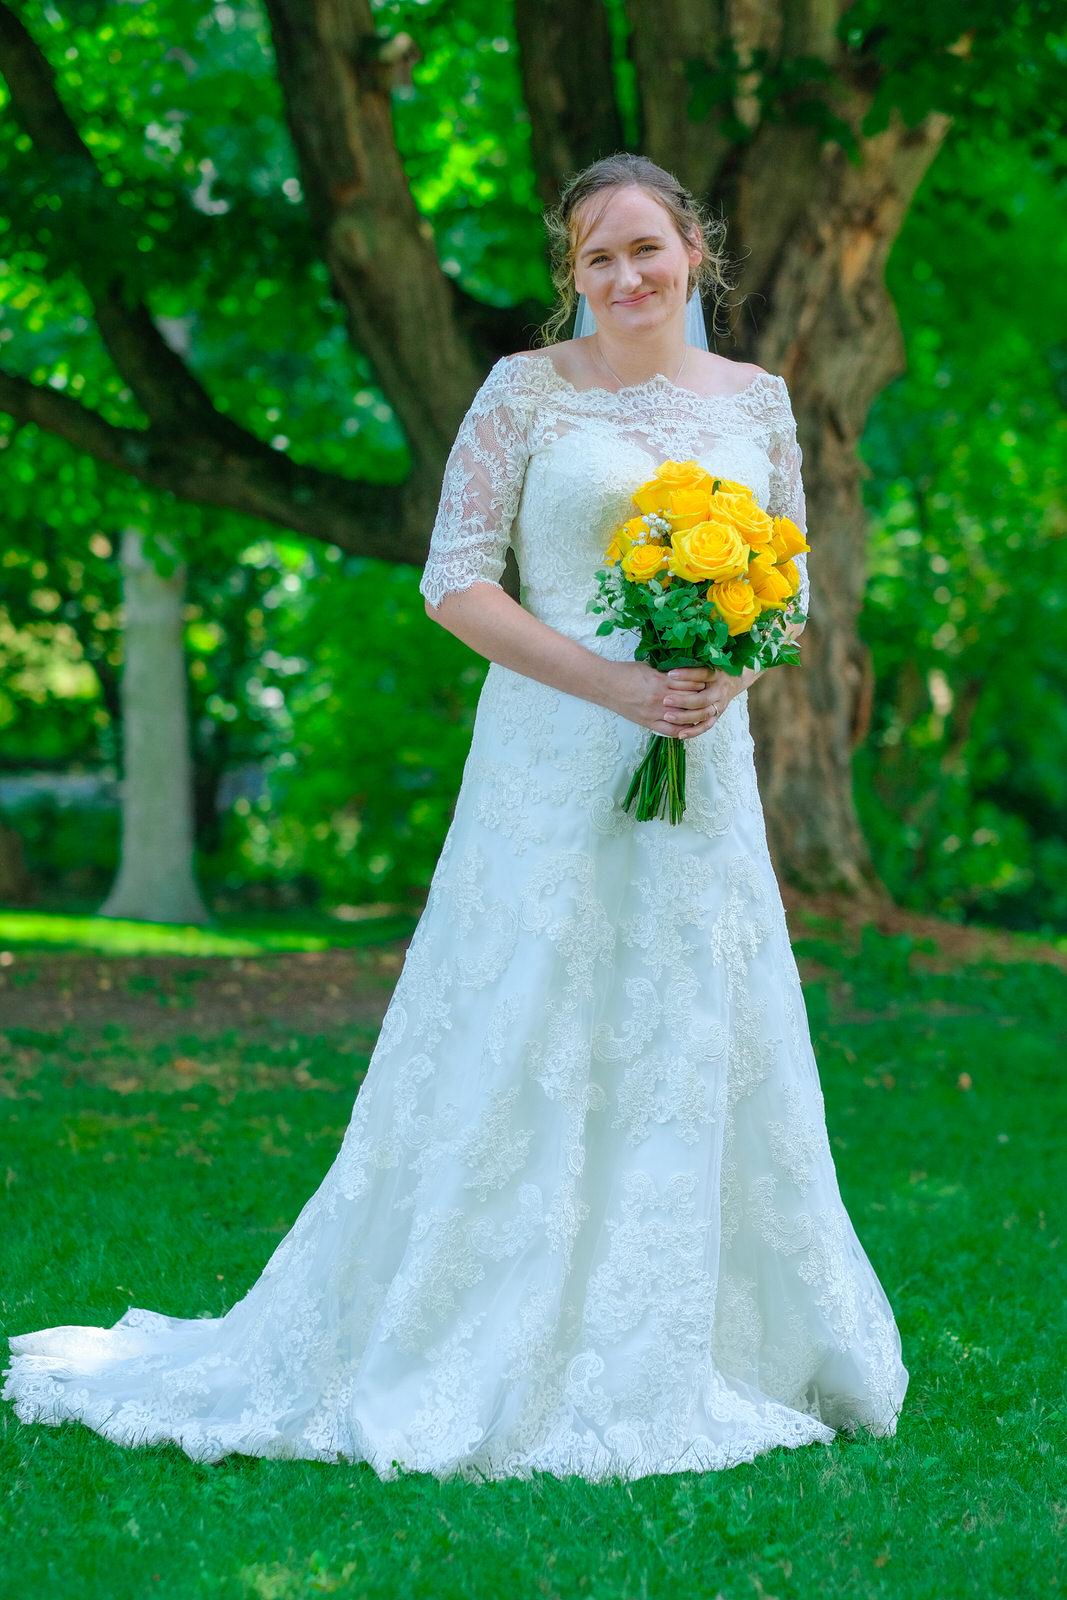 candid-vermont-wedding-photography-434.jpg